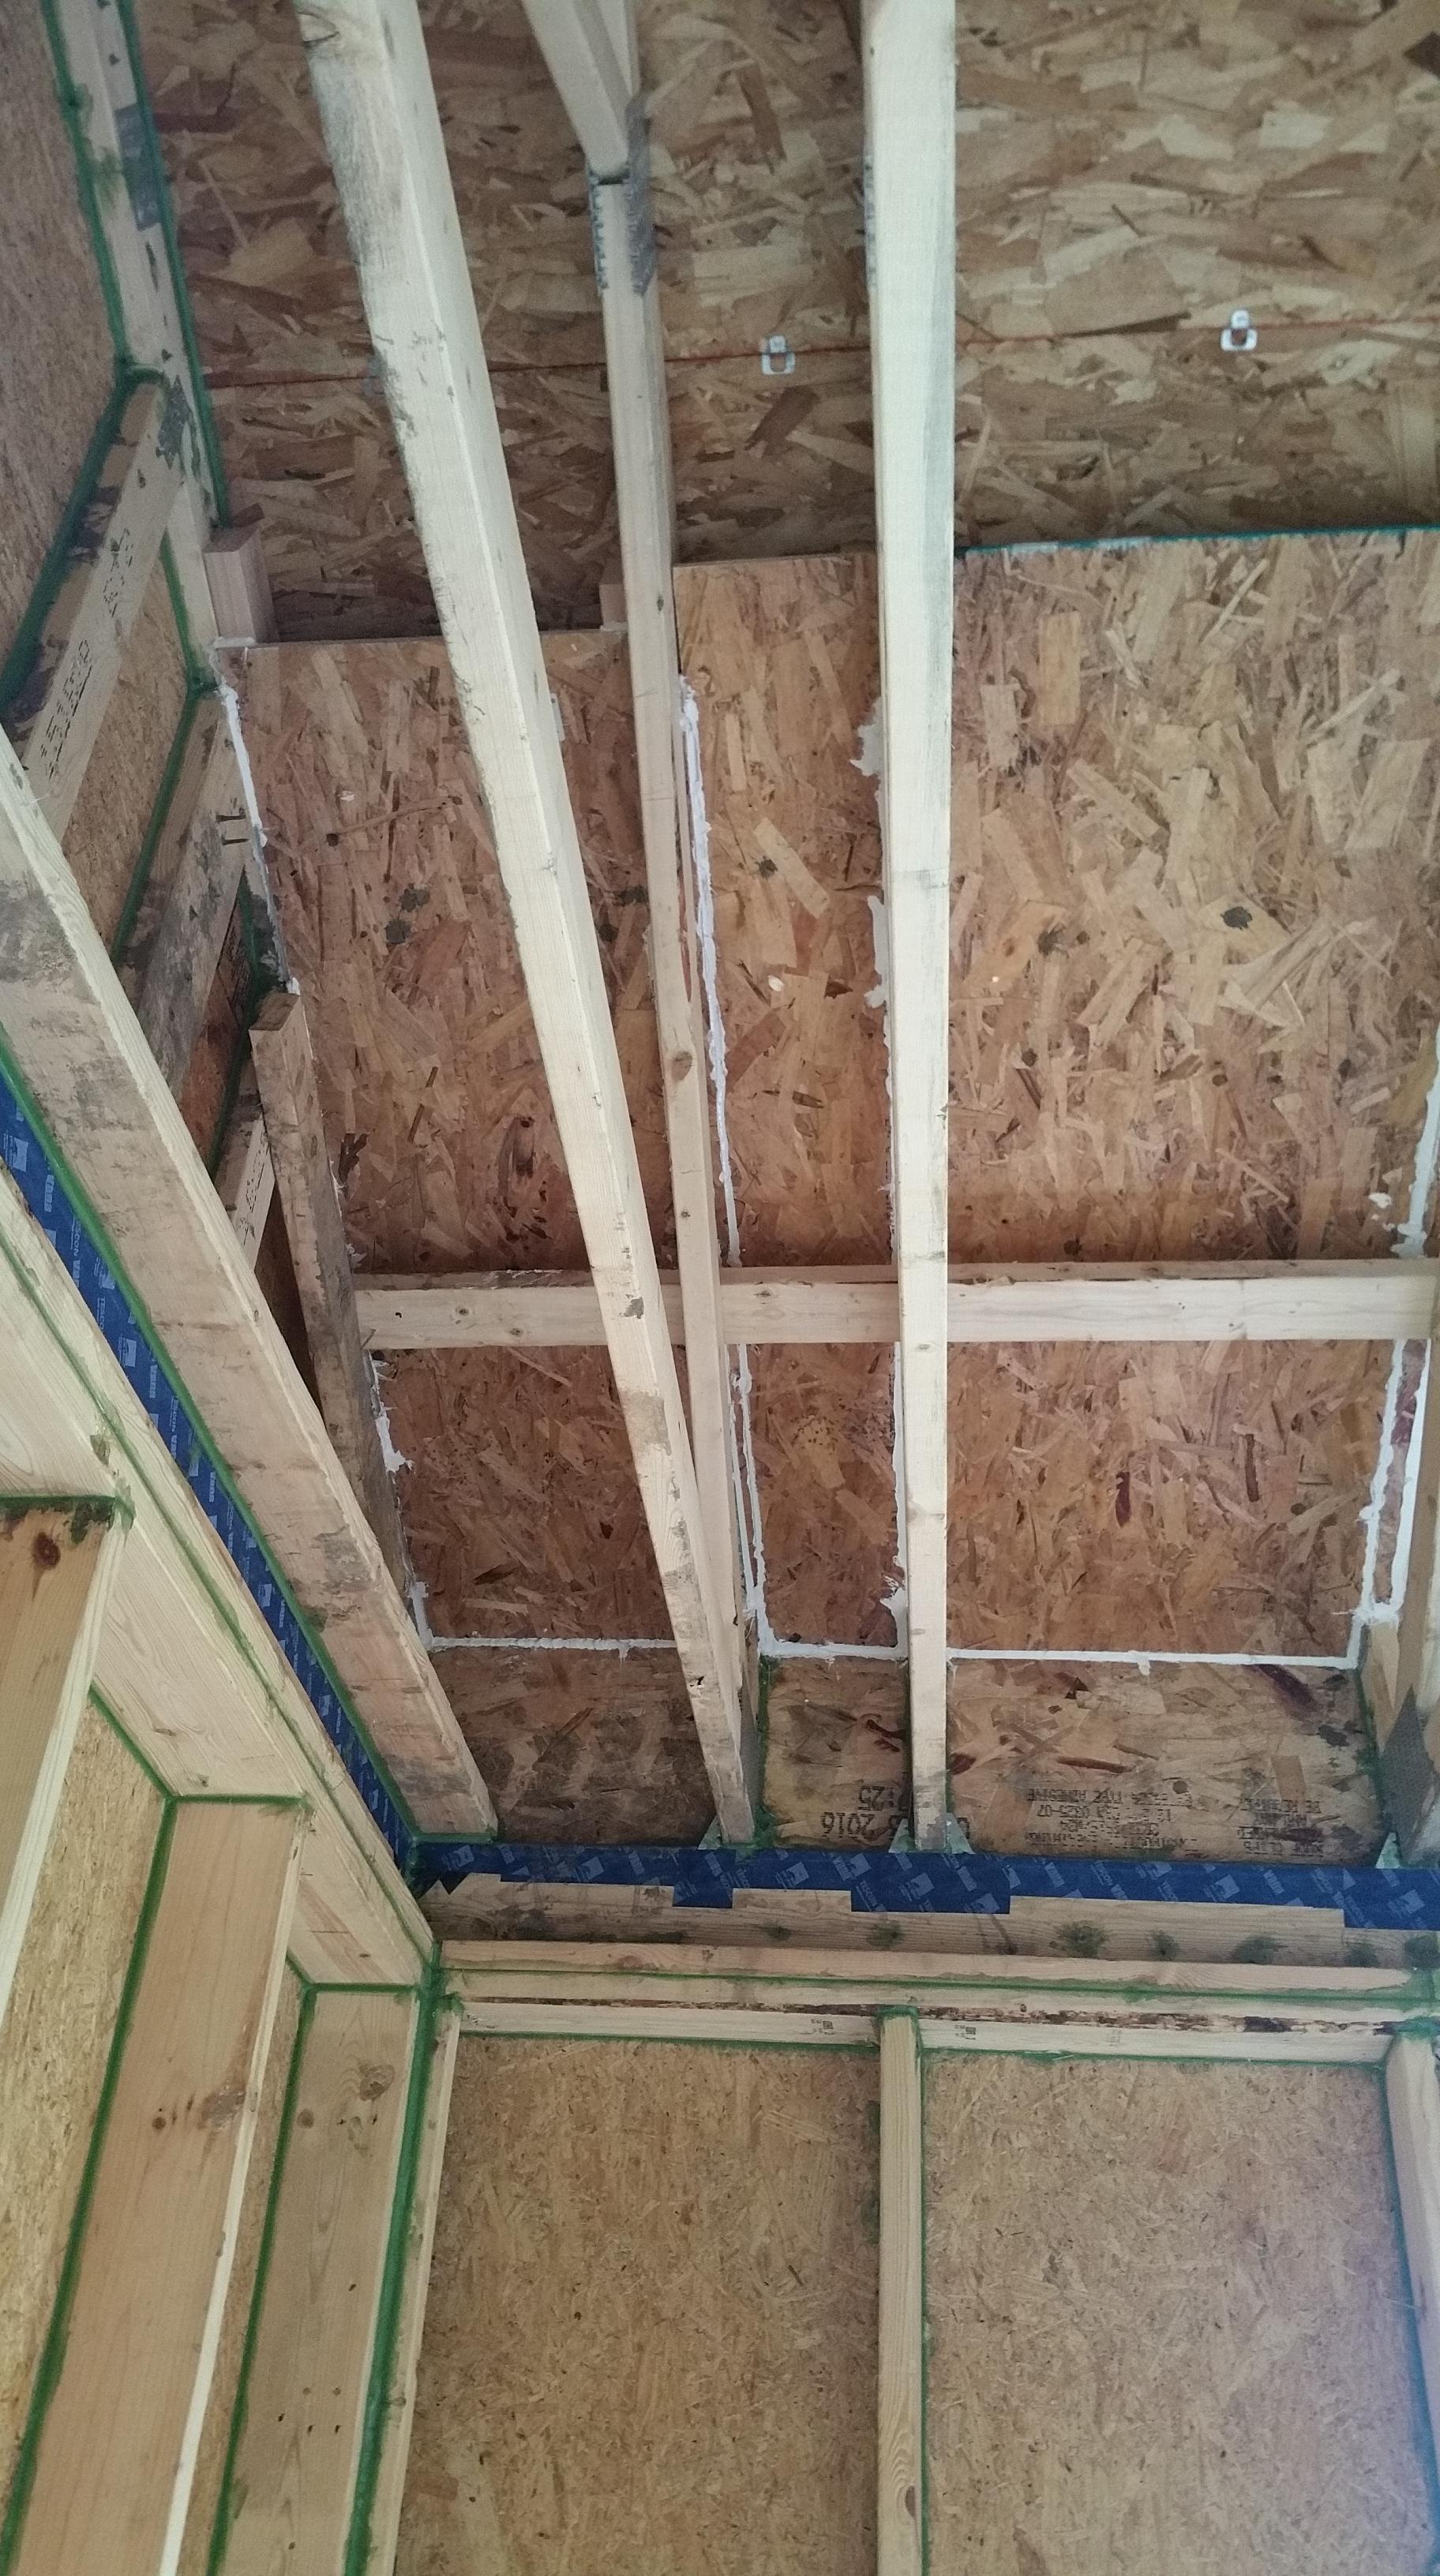 insulation chutes in corner